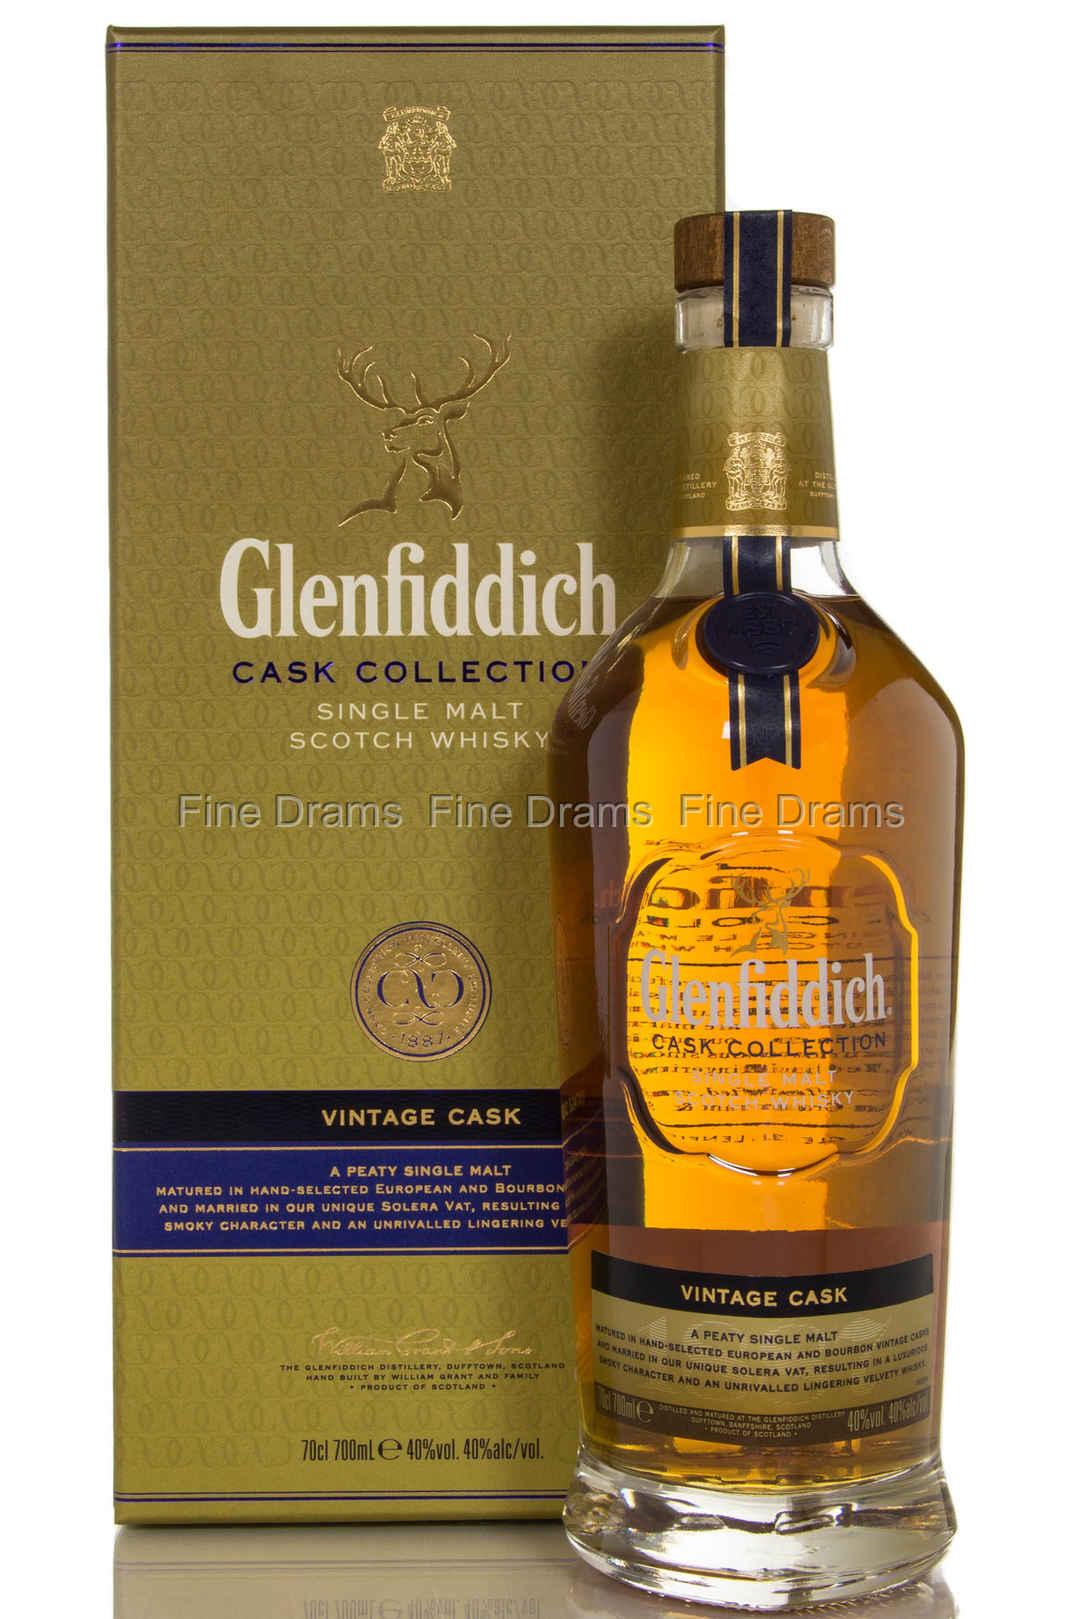 Glenfiddich Cask Collection Vintage Cask Single Malt